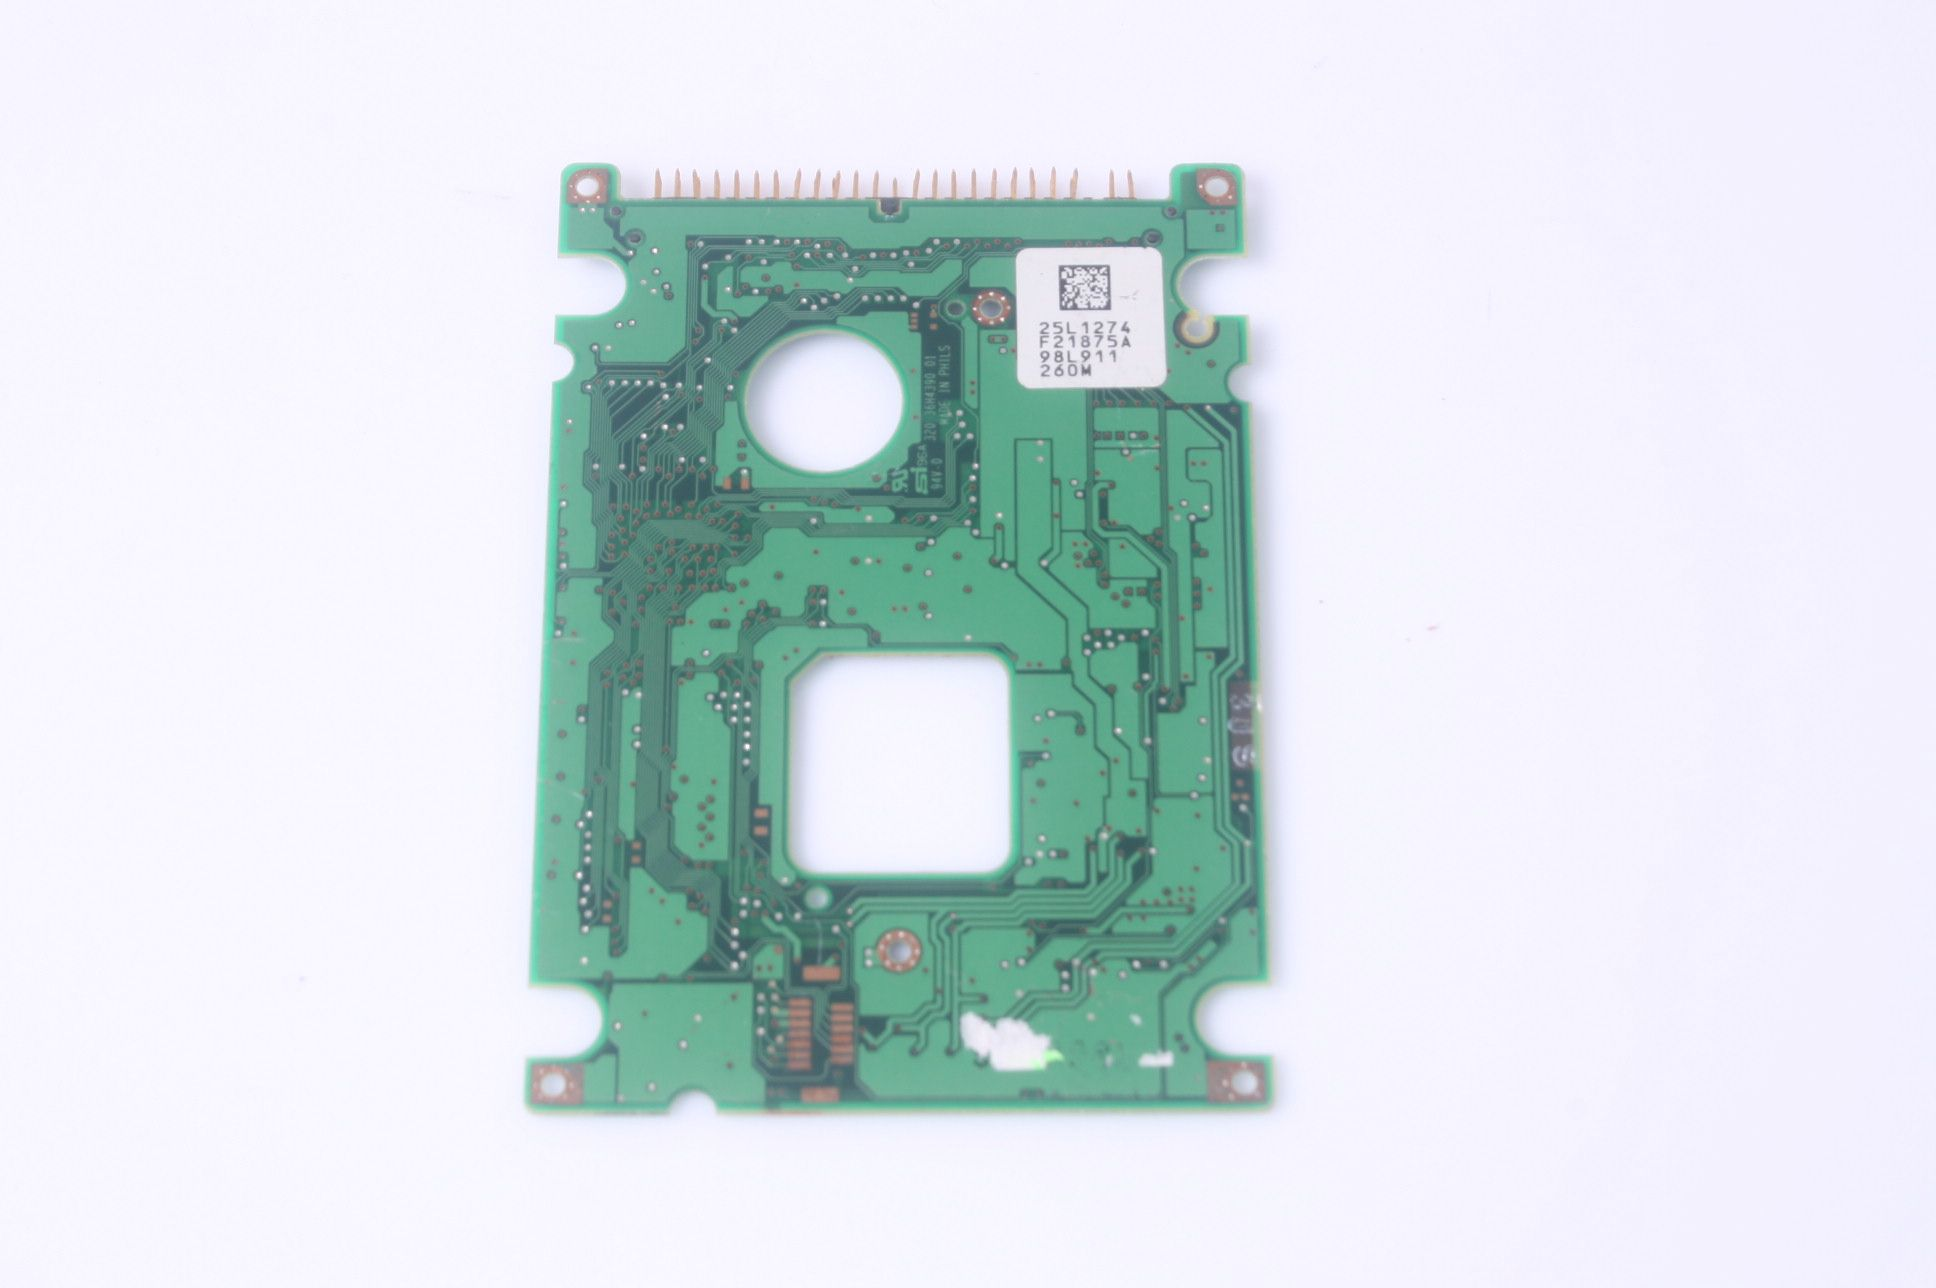 IBM DKLA-24090 4GB 2.5 IDE HARD DRIVE / PCB (CIRCUIT BOARD) ONLY FOR DA